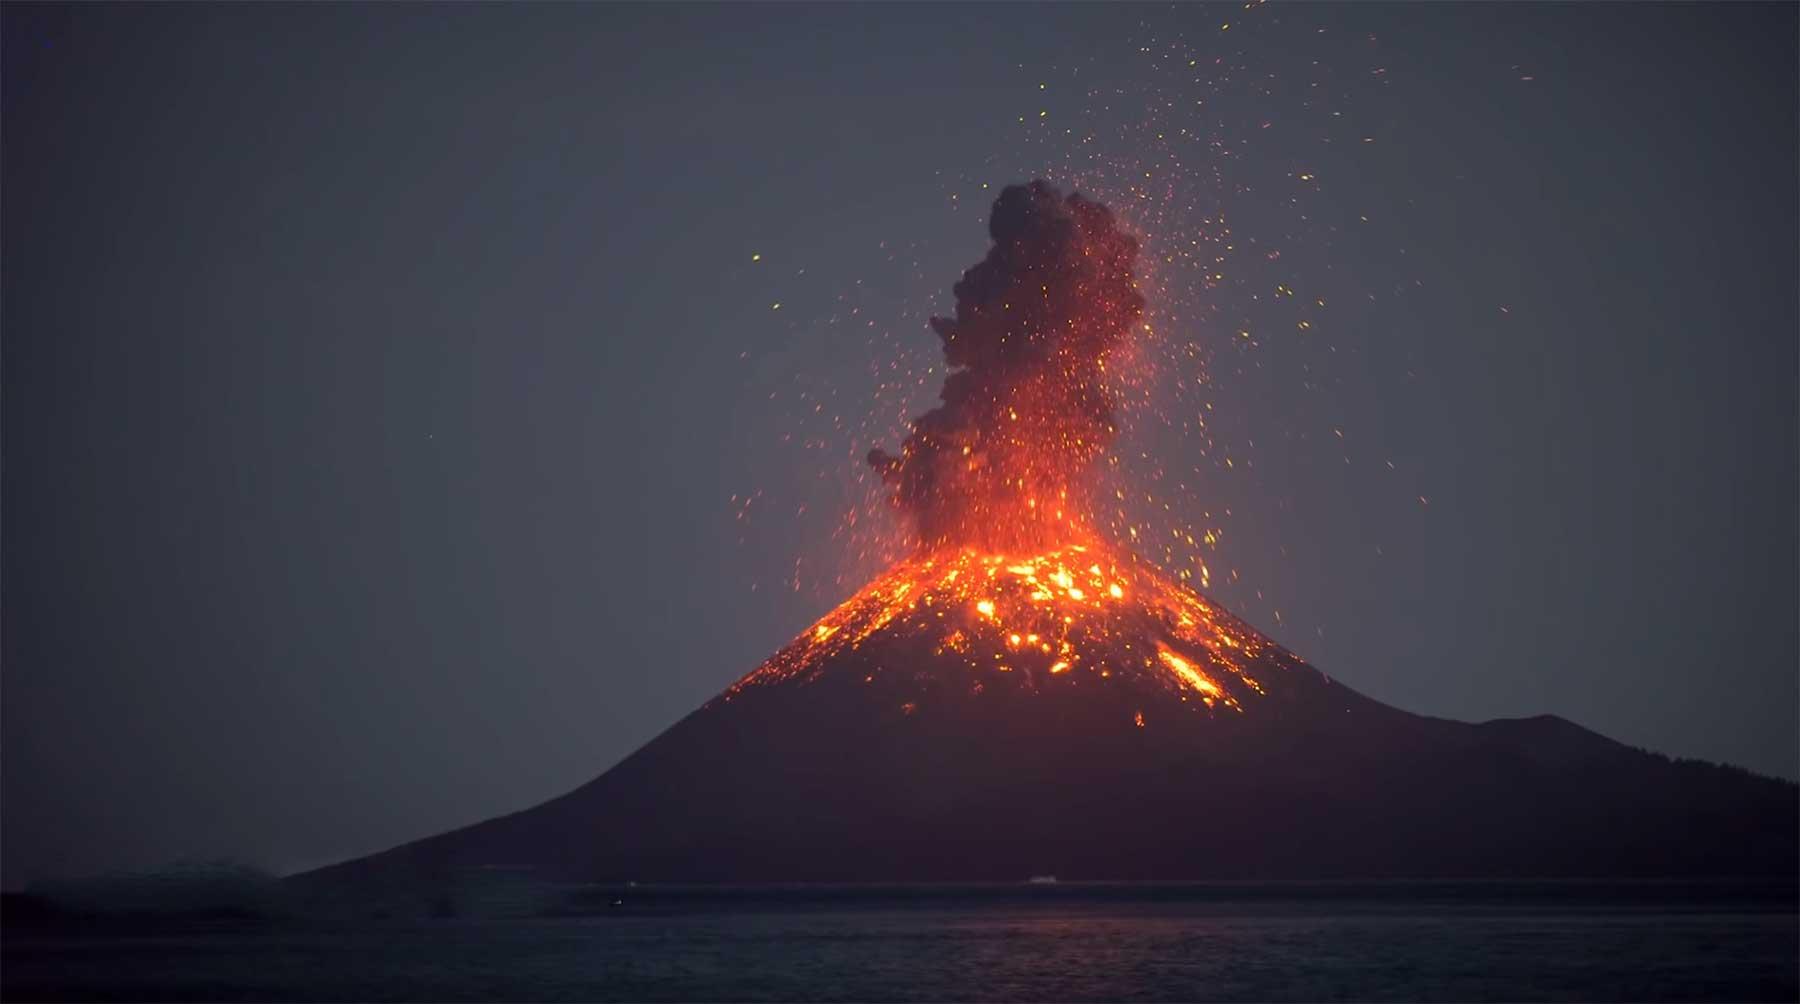 Vulkan-Feuerspucken in Echtzeit Krakatau-at-night